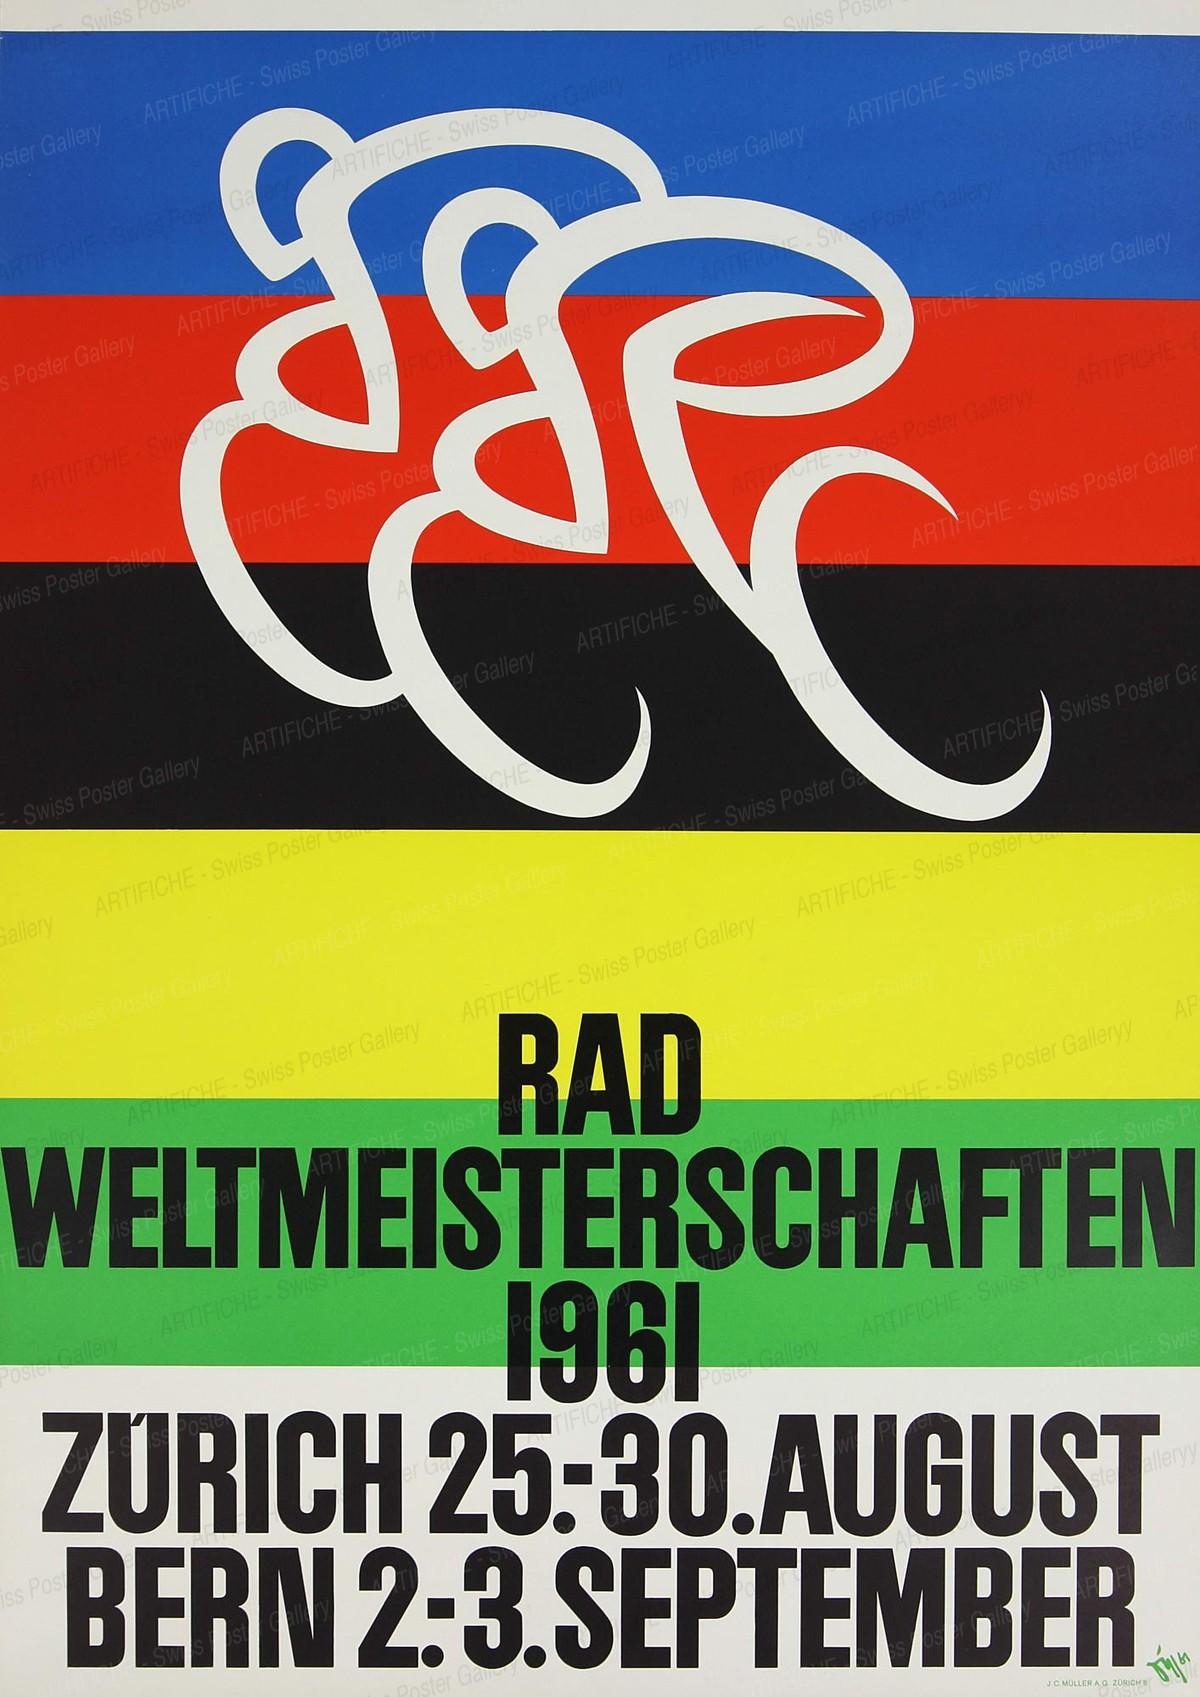 Cycling World Cup 1961, Alex Walter Diggelmann